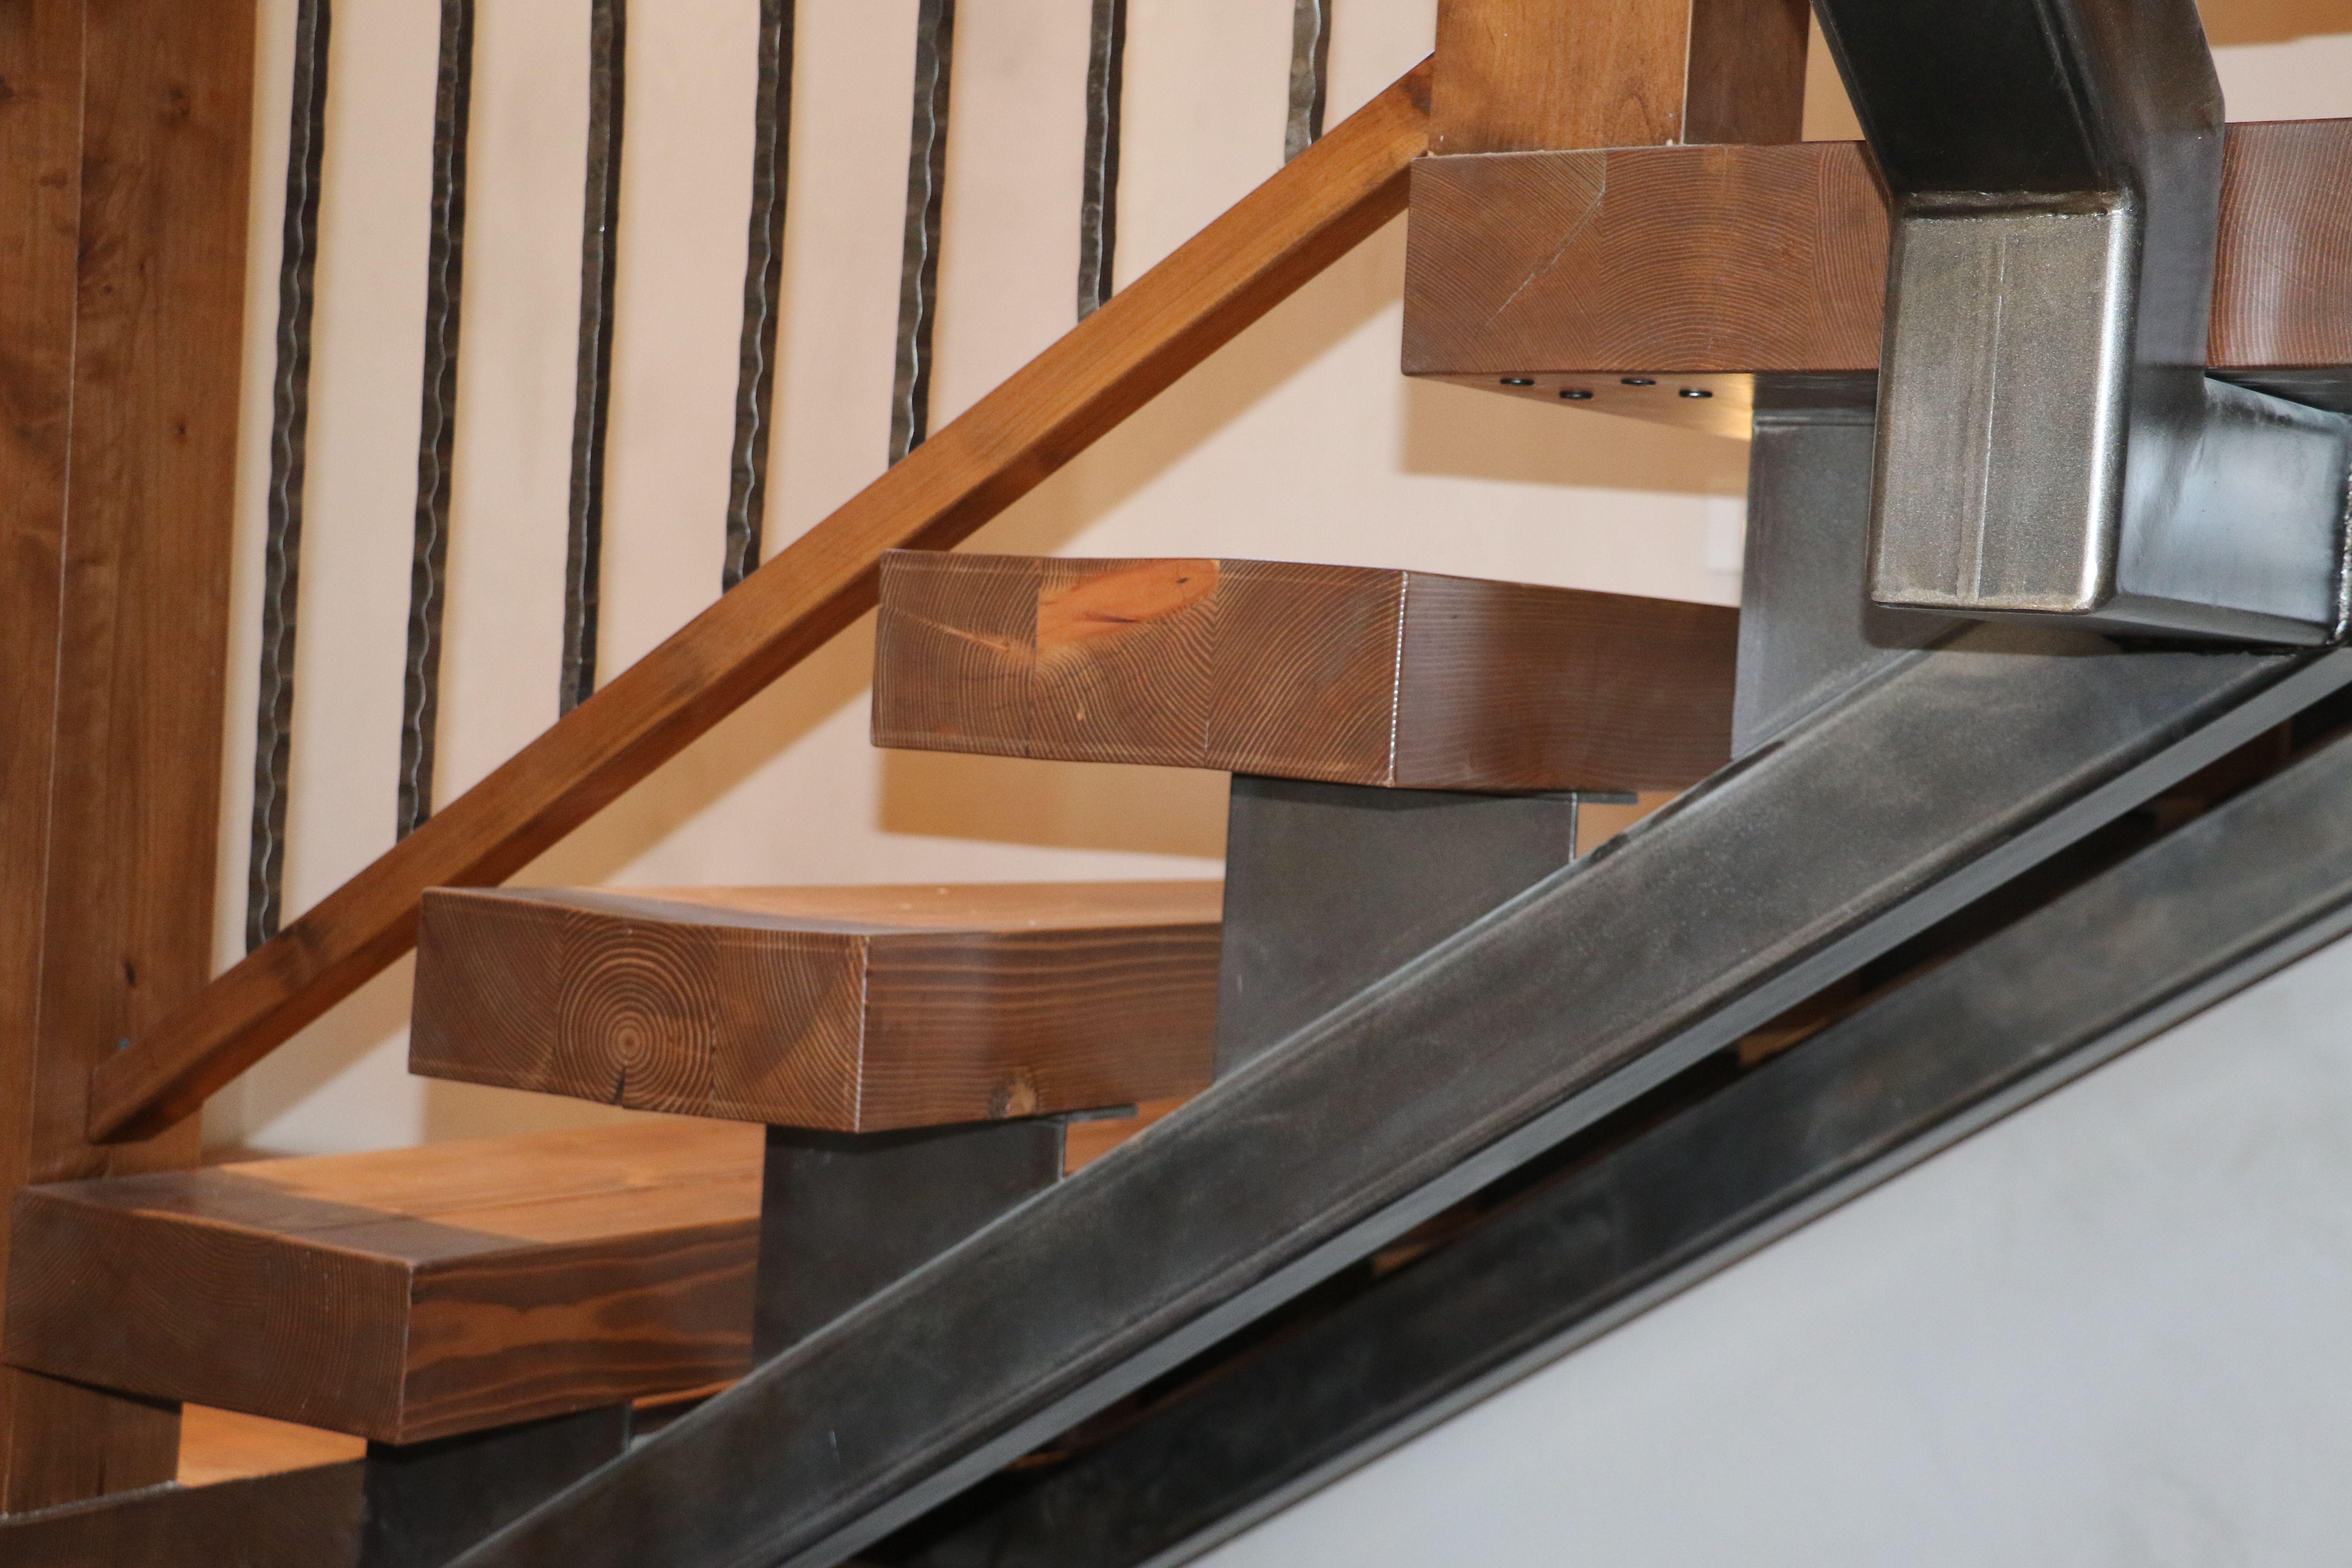 Metal Stringer Under Douglas Fir Treads For Stairs